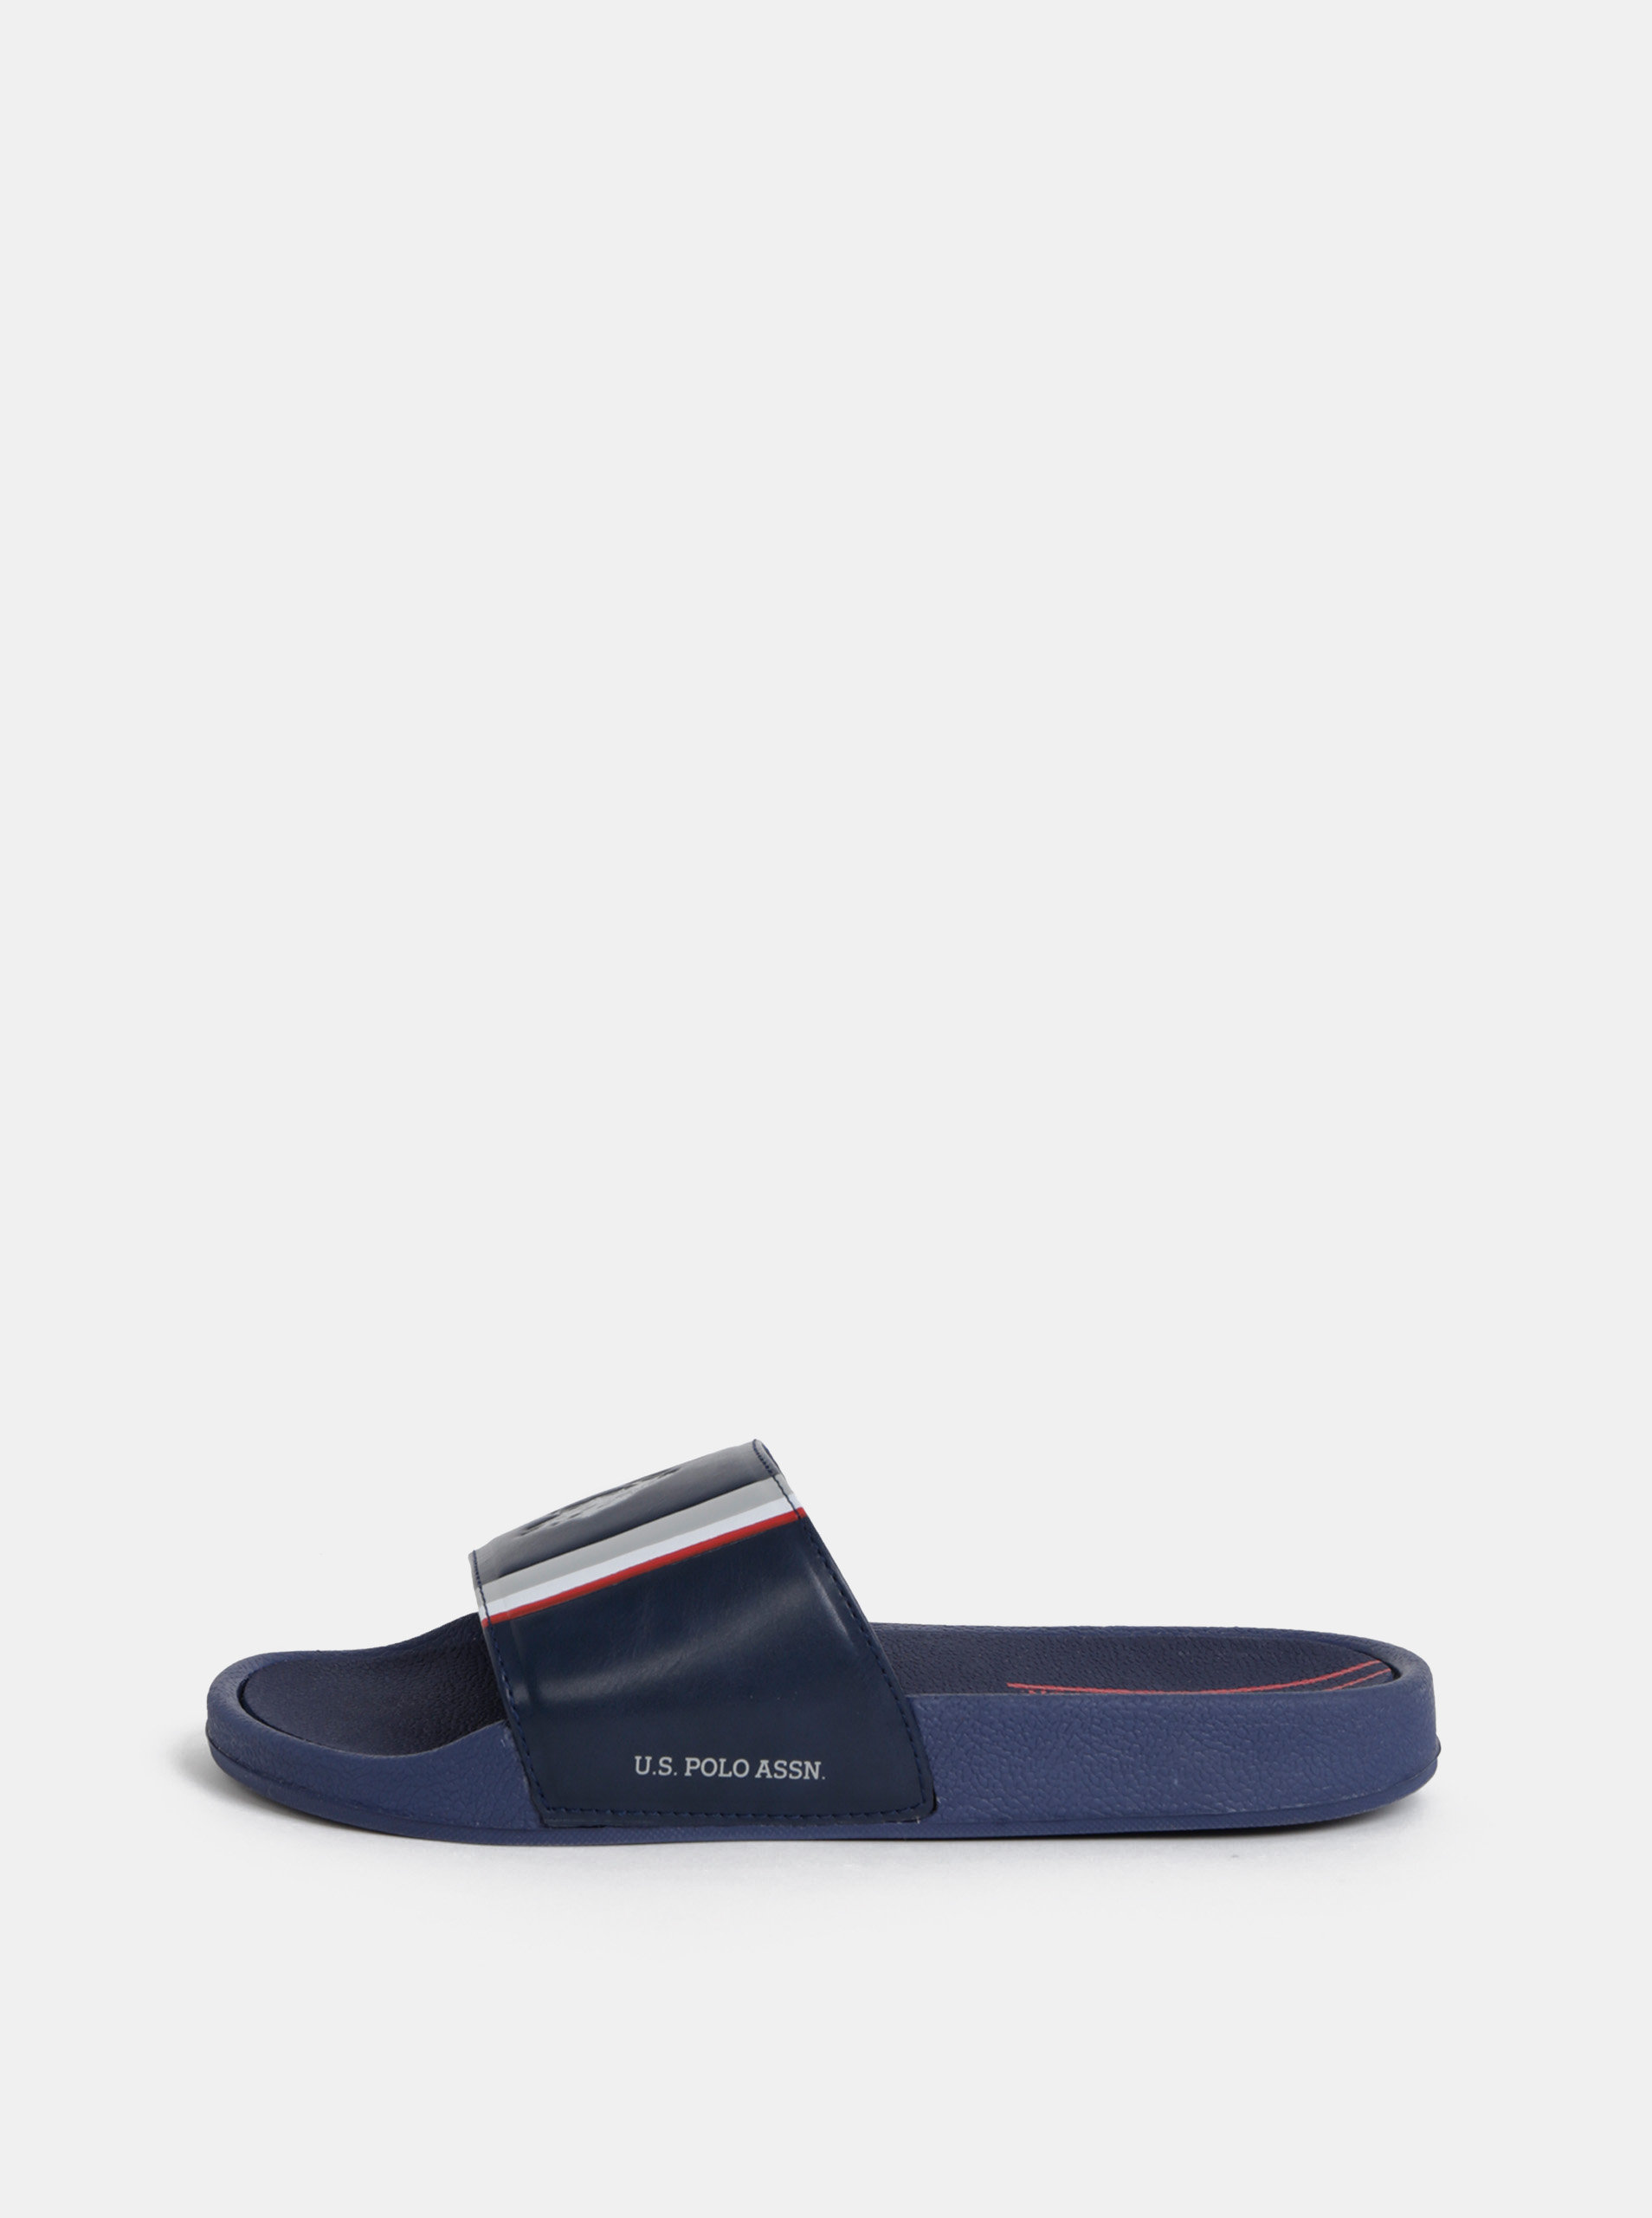 c8d3eb047a Tmavě modré pánské pantofle U.S. Polo Assn. ...